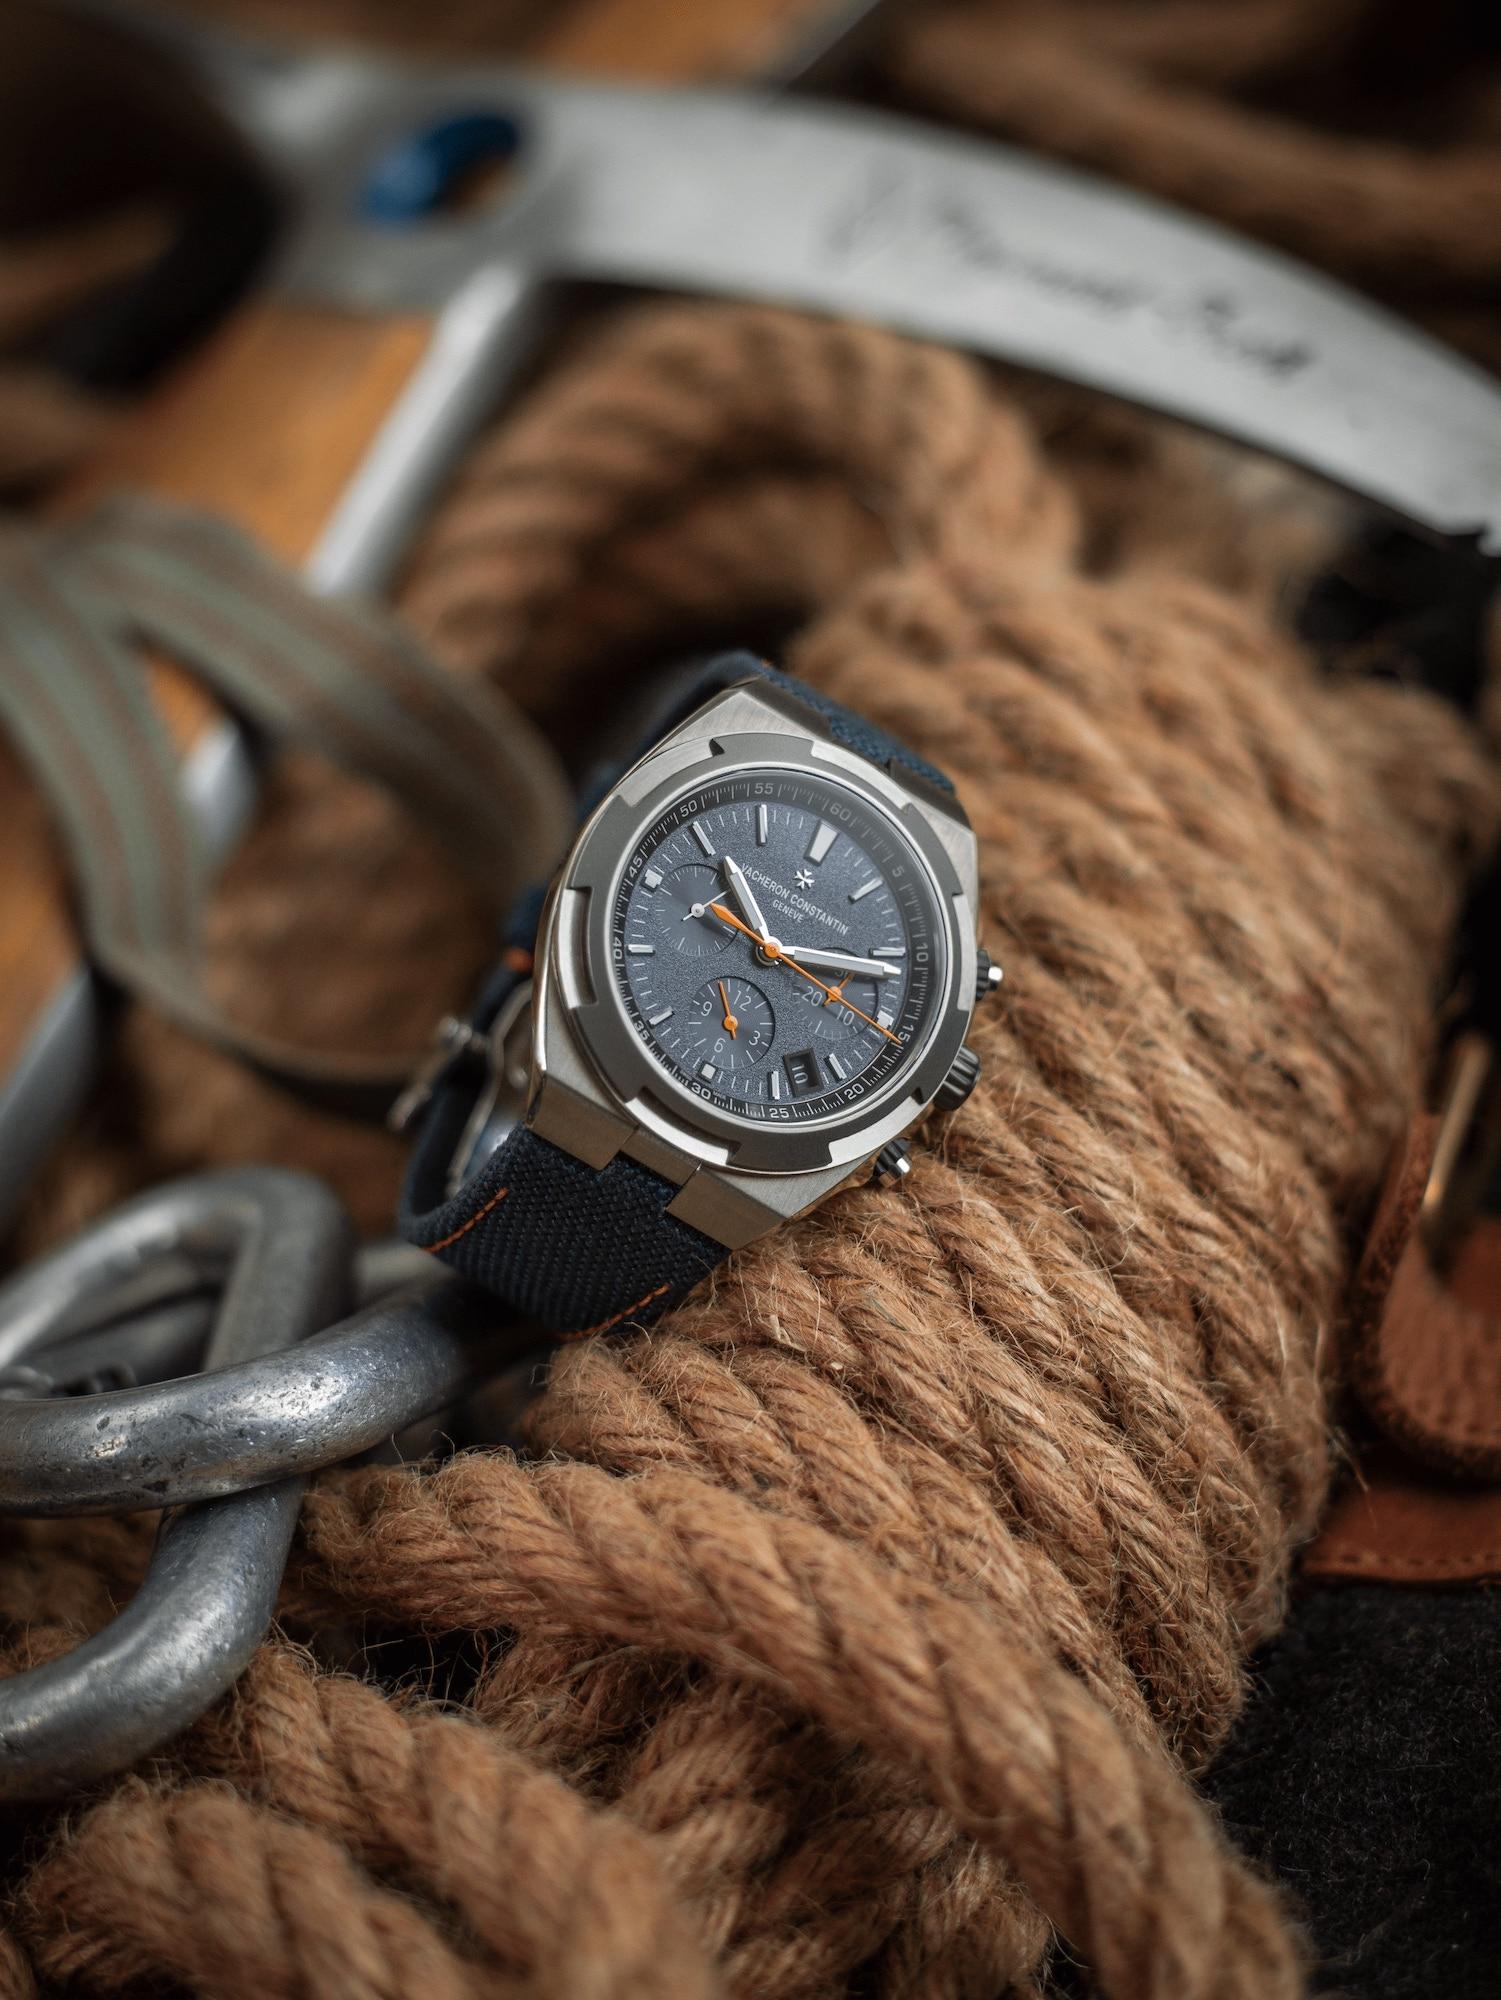 Vacheron Constantin Overseas Chronograph Everest 5510V:000T-B923 Lifestyle